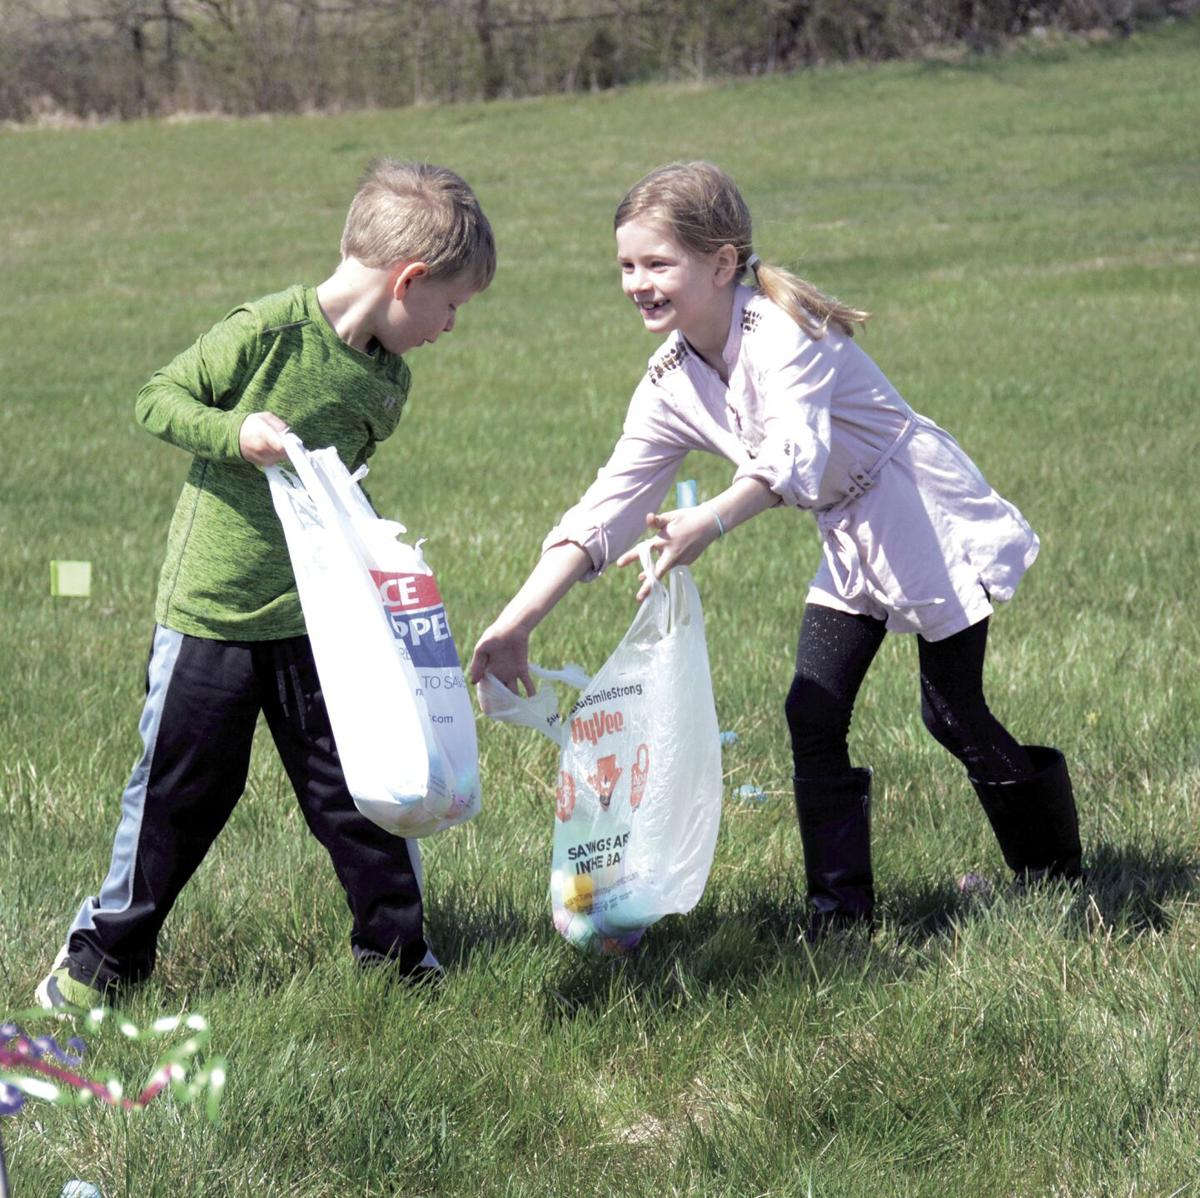 Kearney Easter Egg-sperience